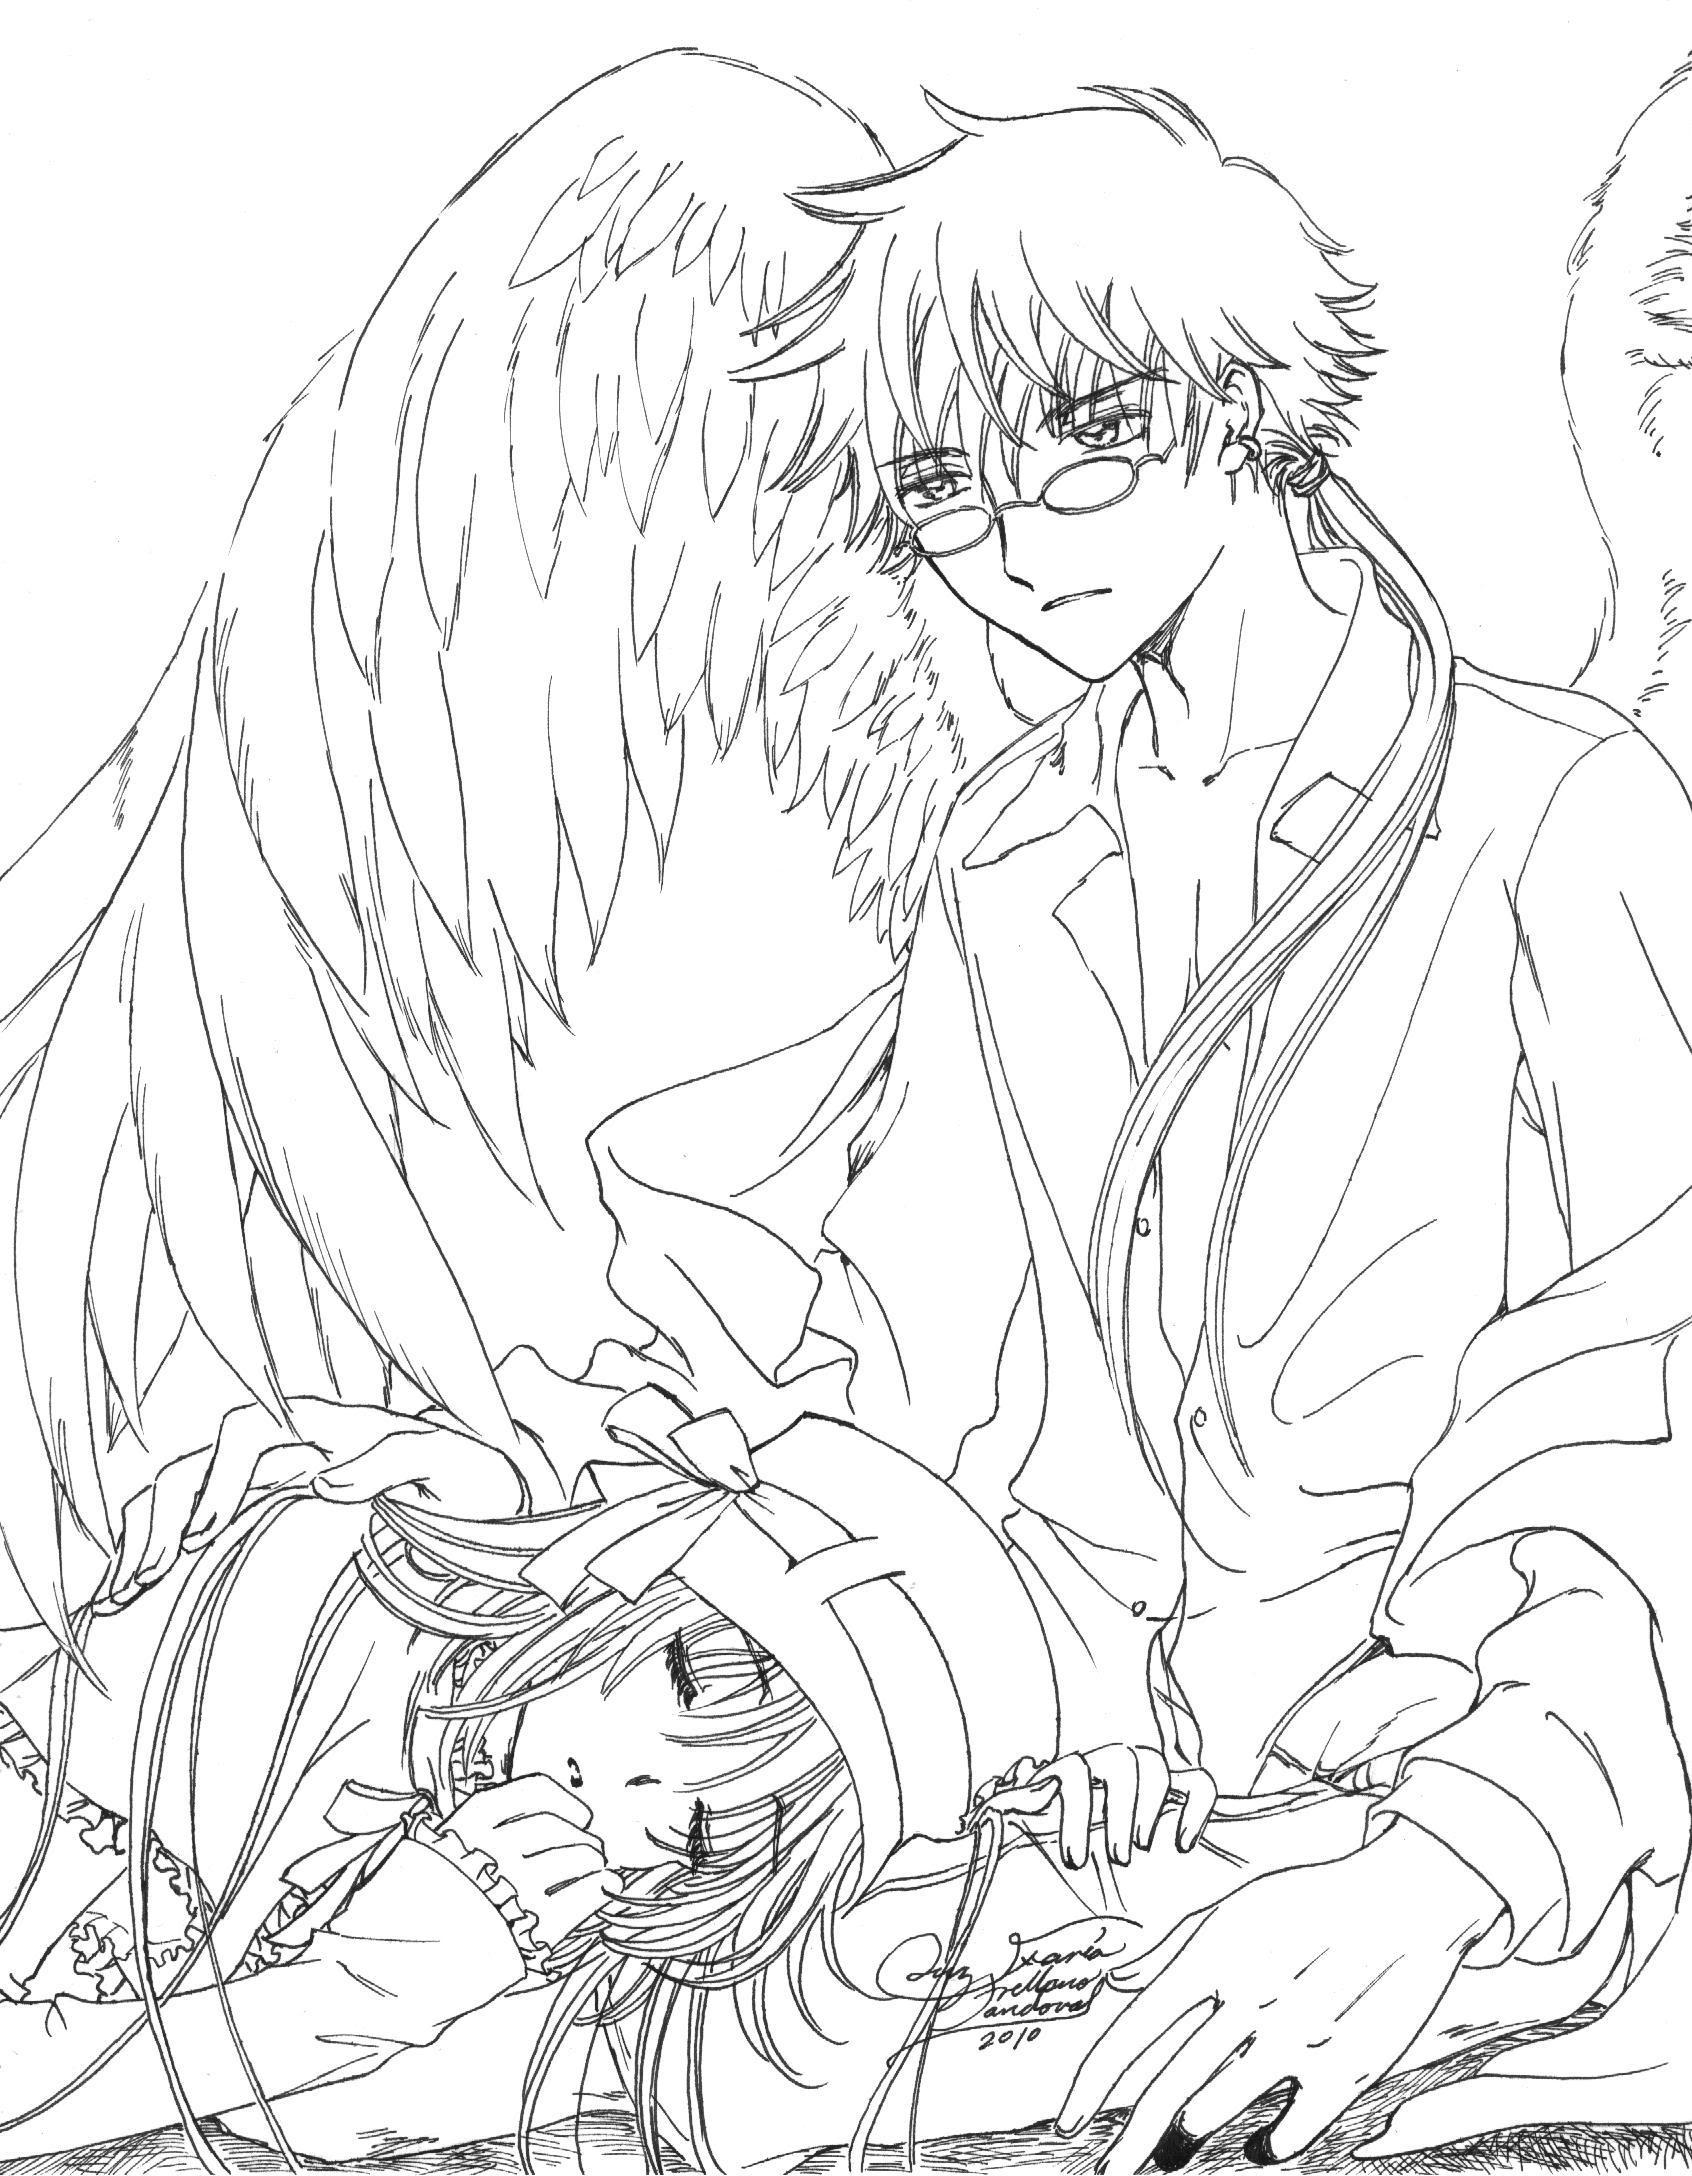 Lujoso Anime Bff Para Colorear Ilustración - Ideas Para Colorear ...